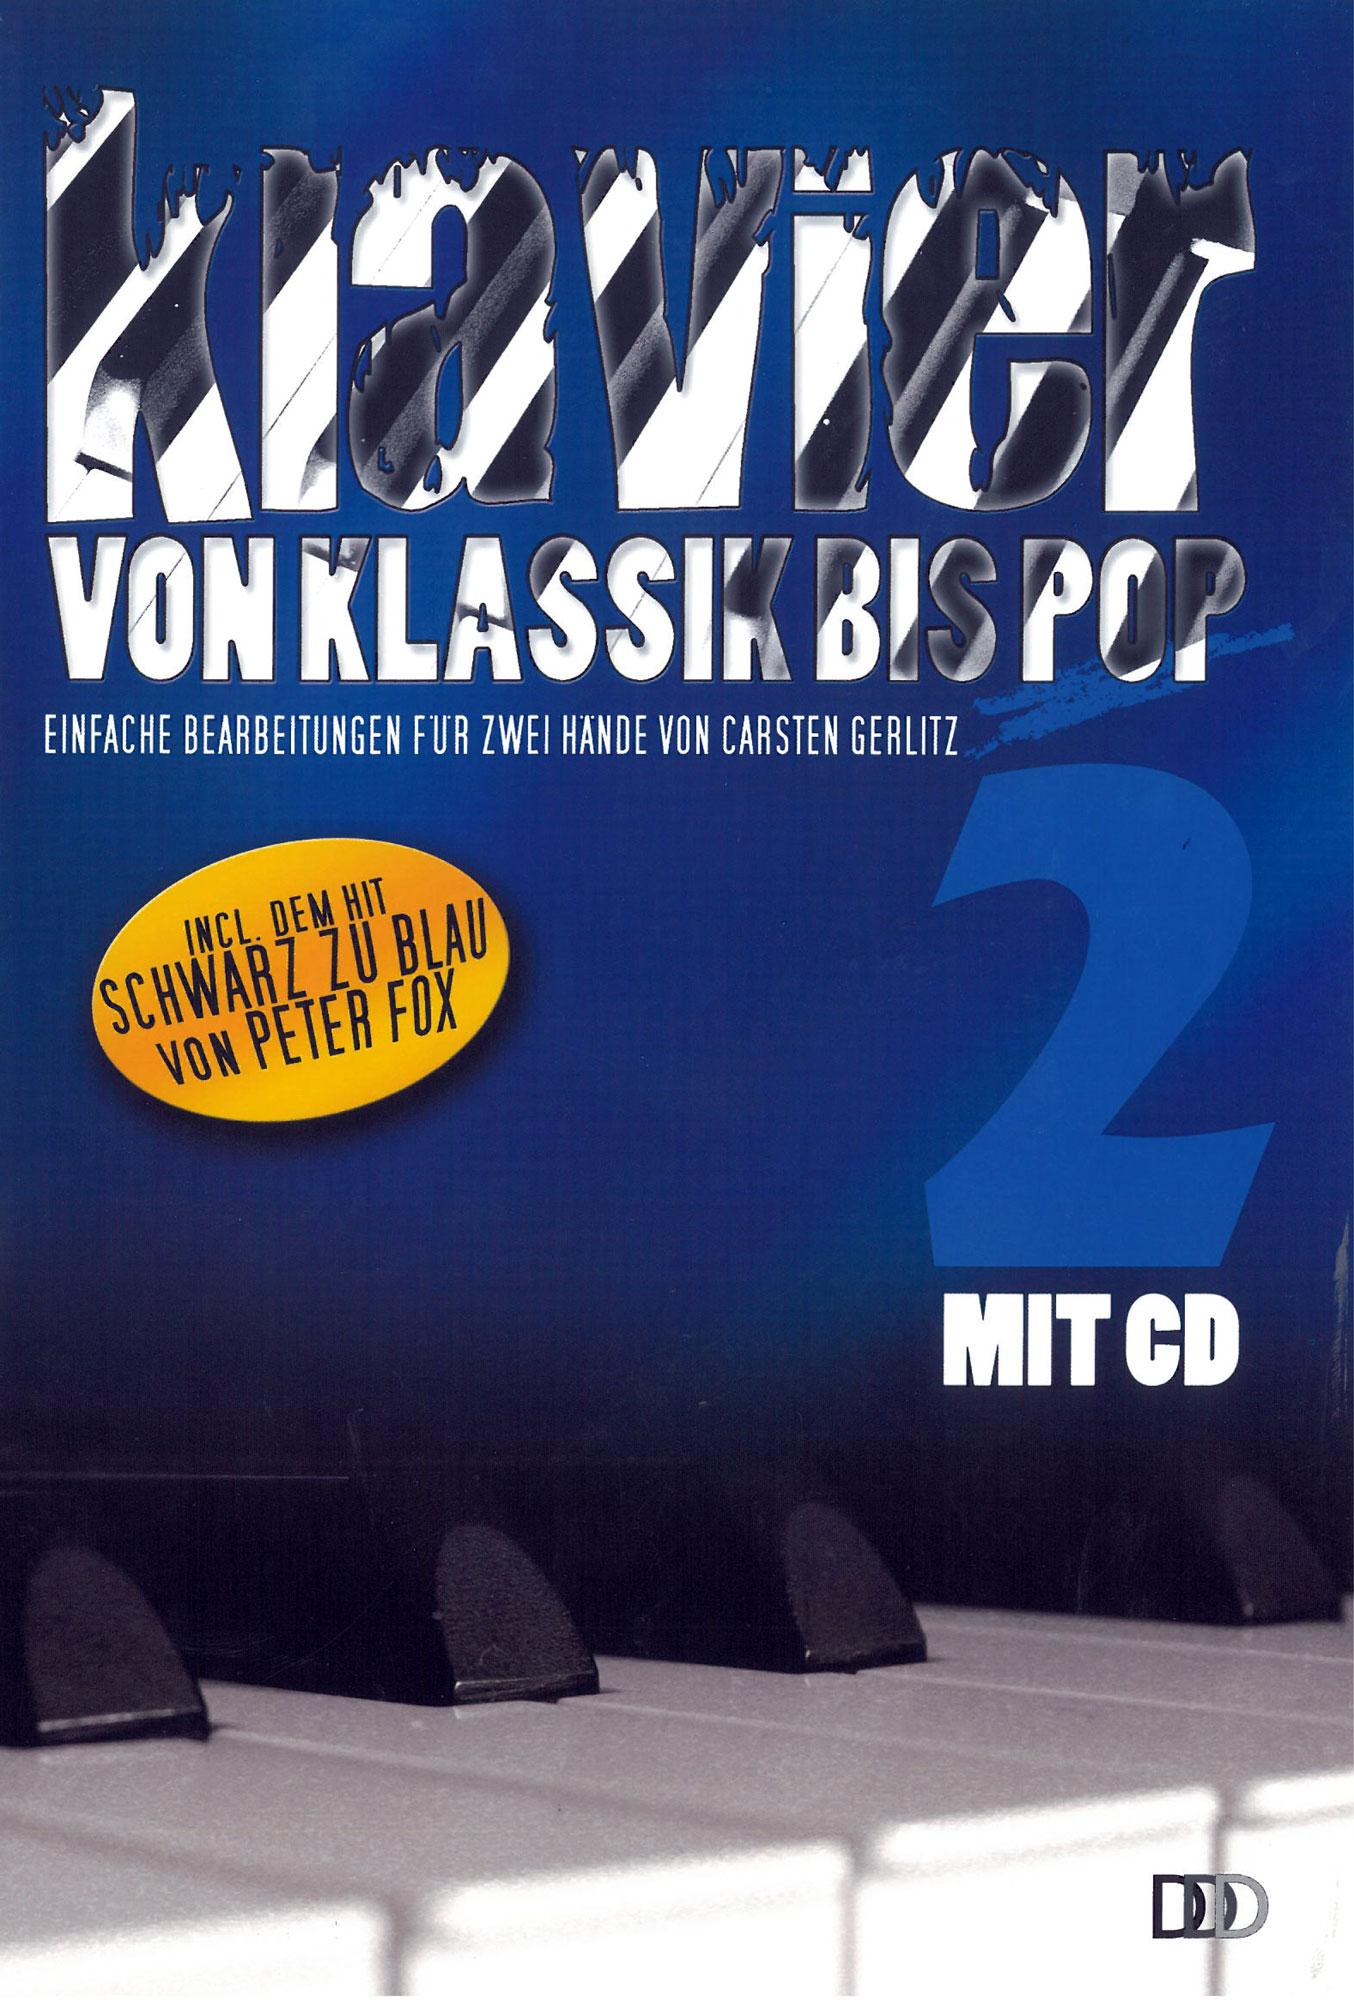 Klavier von Klassik bis Pop Band 2